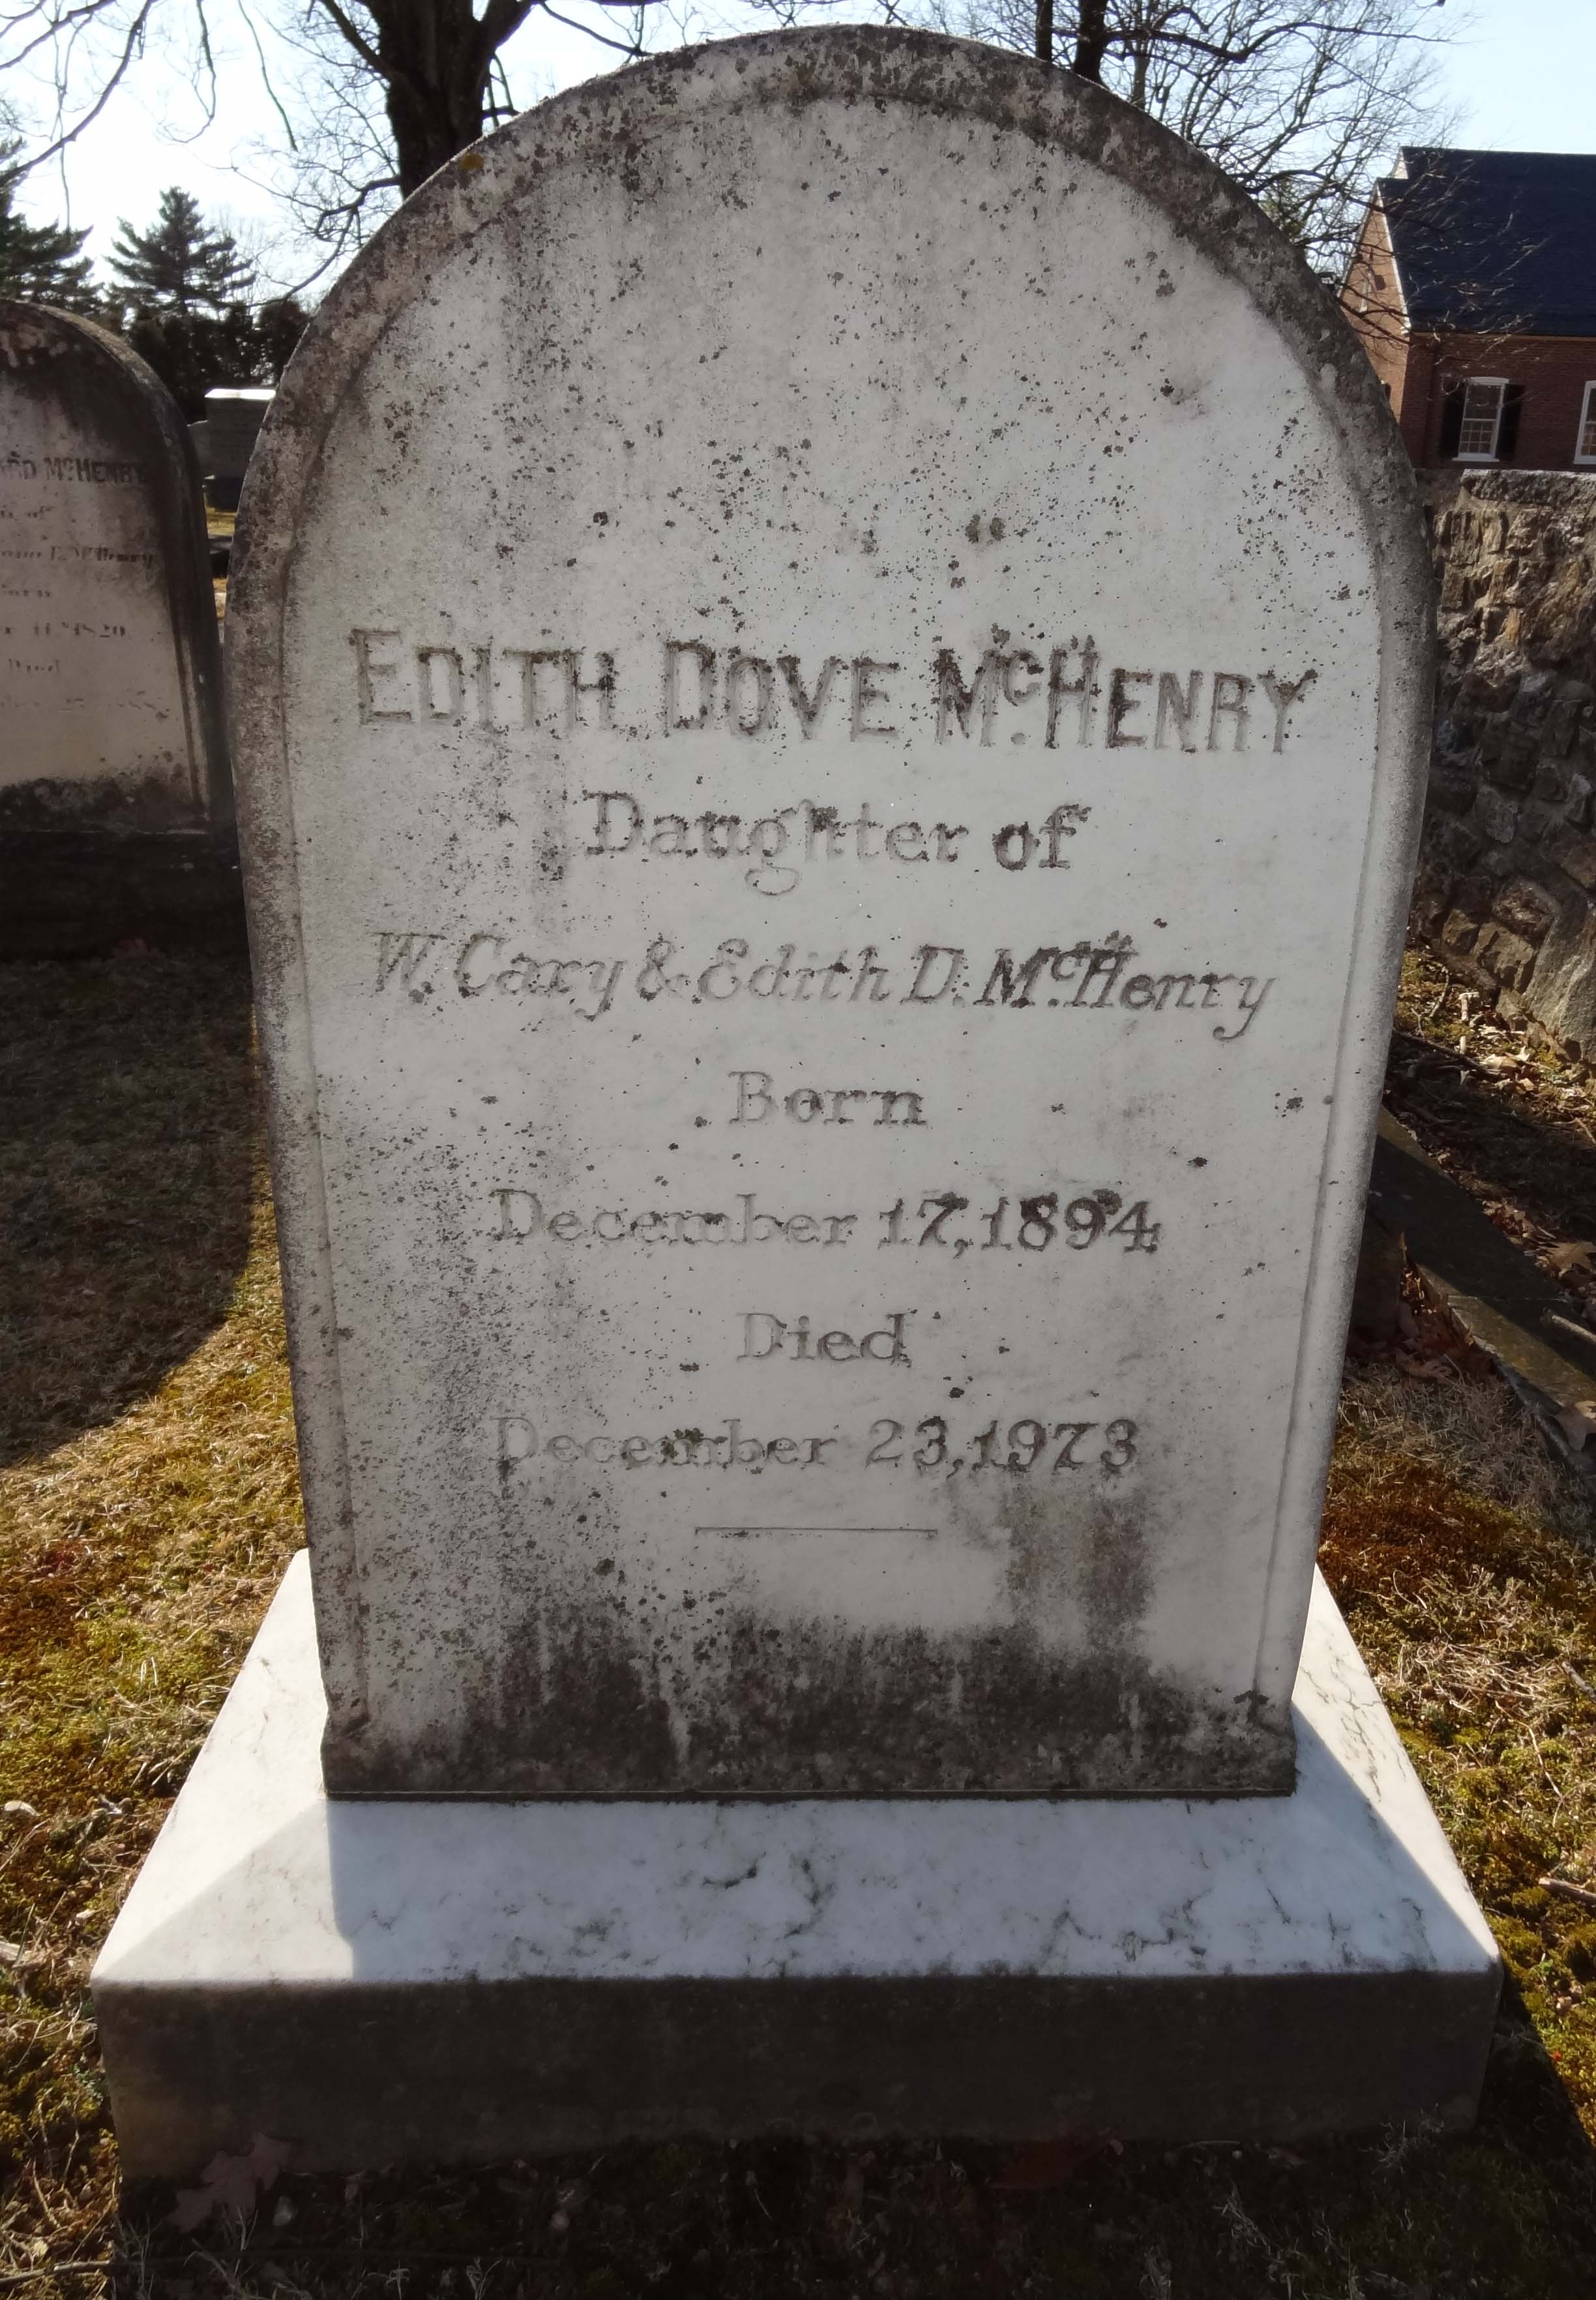 Edith Dove McHenry